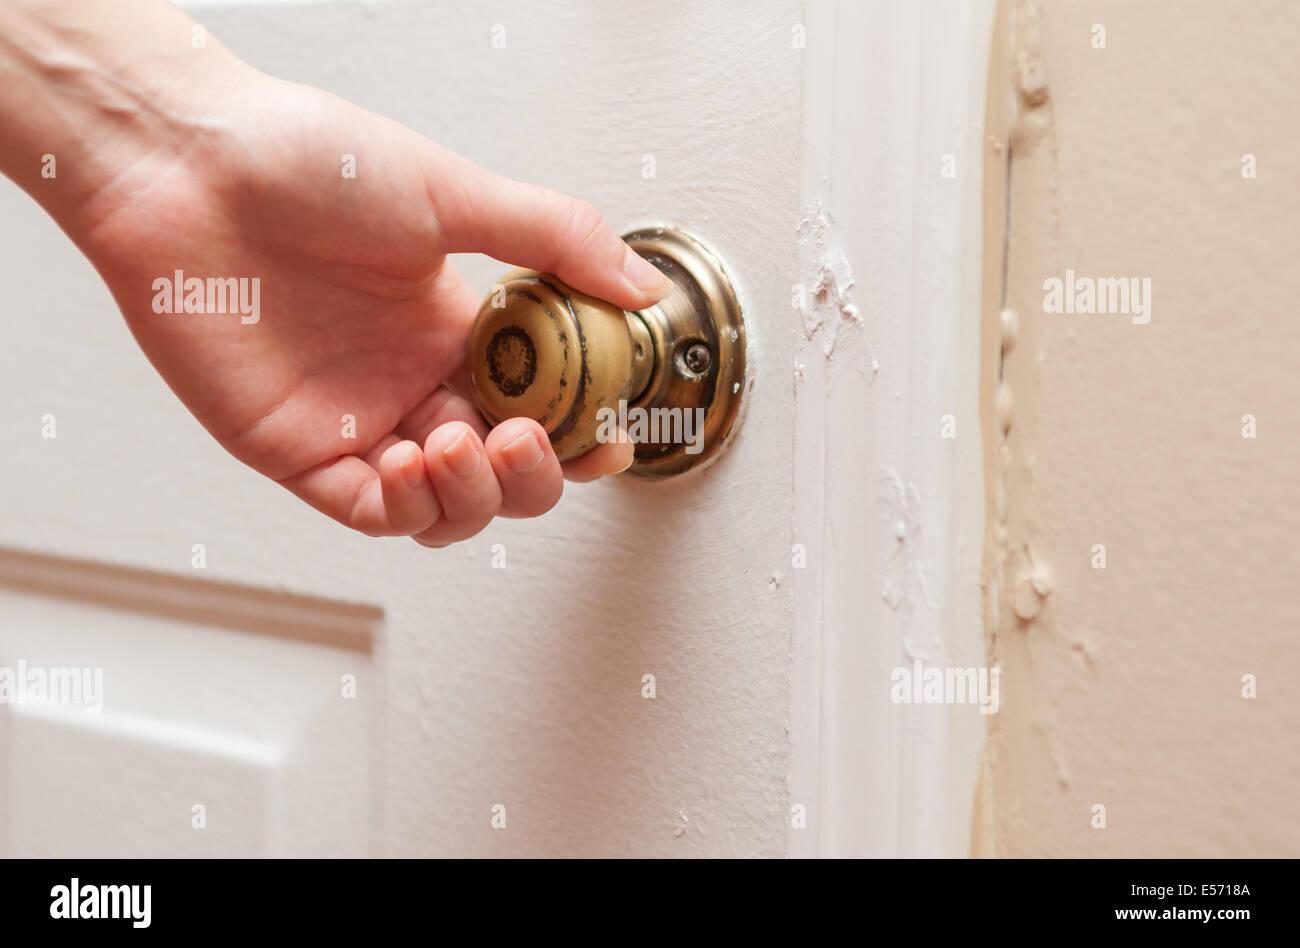 Hand opening door knob Stock Photo, Royalty Free Image: 72069434 ...